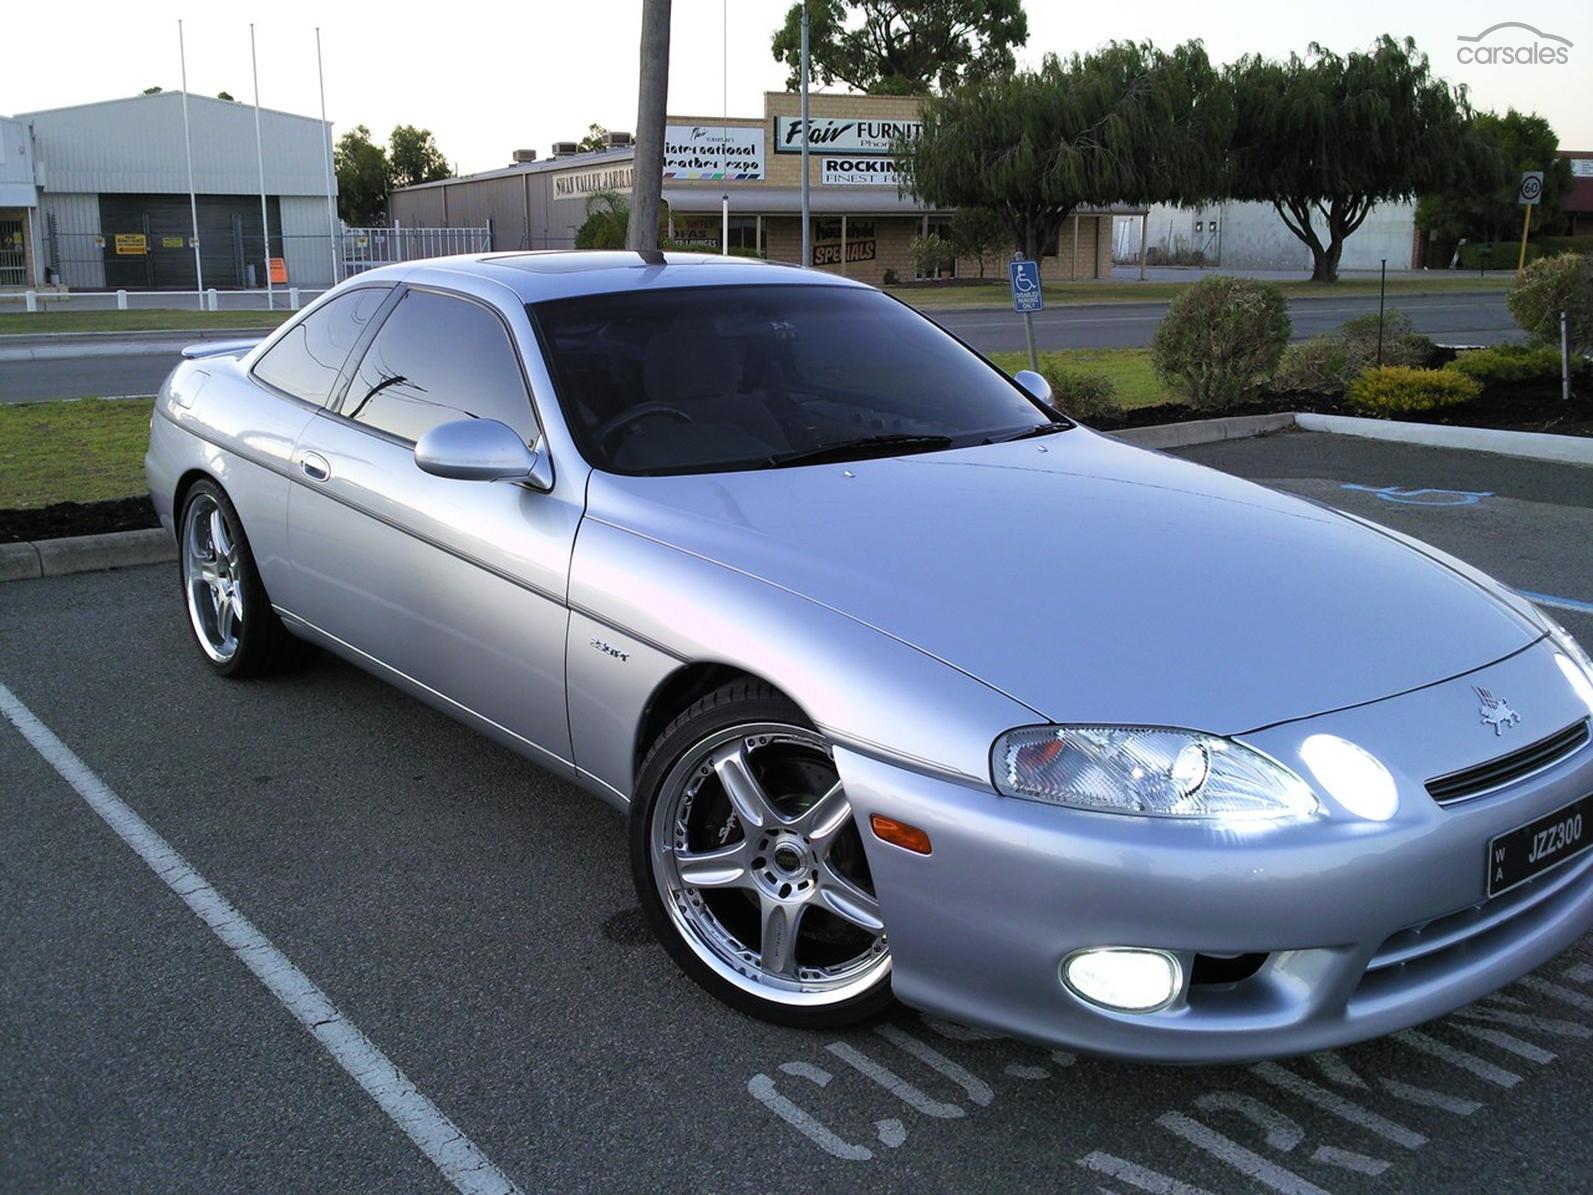 1996 Toyota Soarer Turbo GT-T Manual-SSE-AD-3055751 - carsales com au